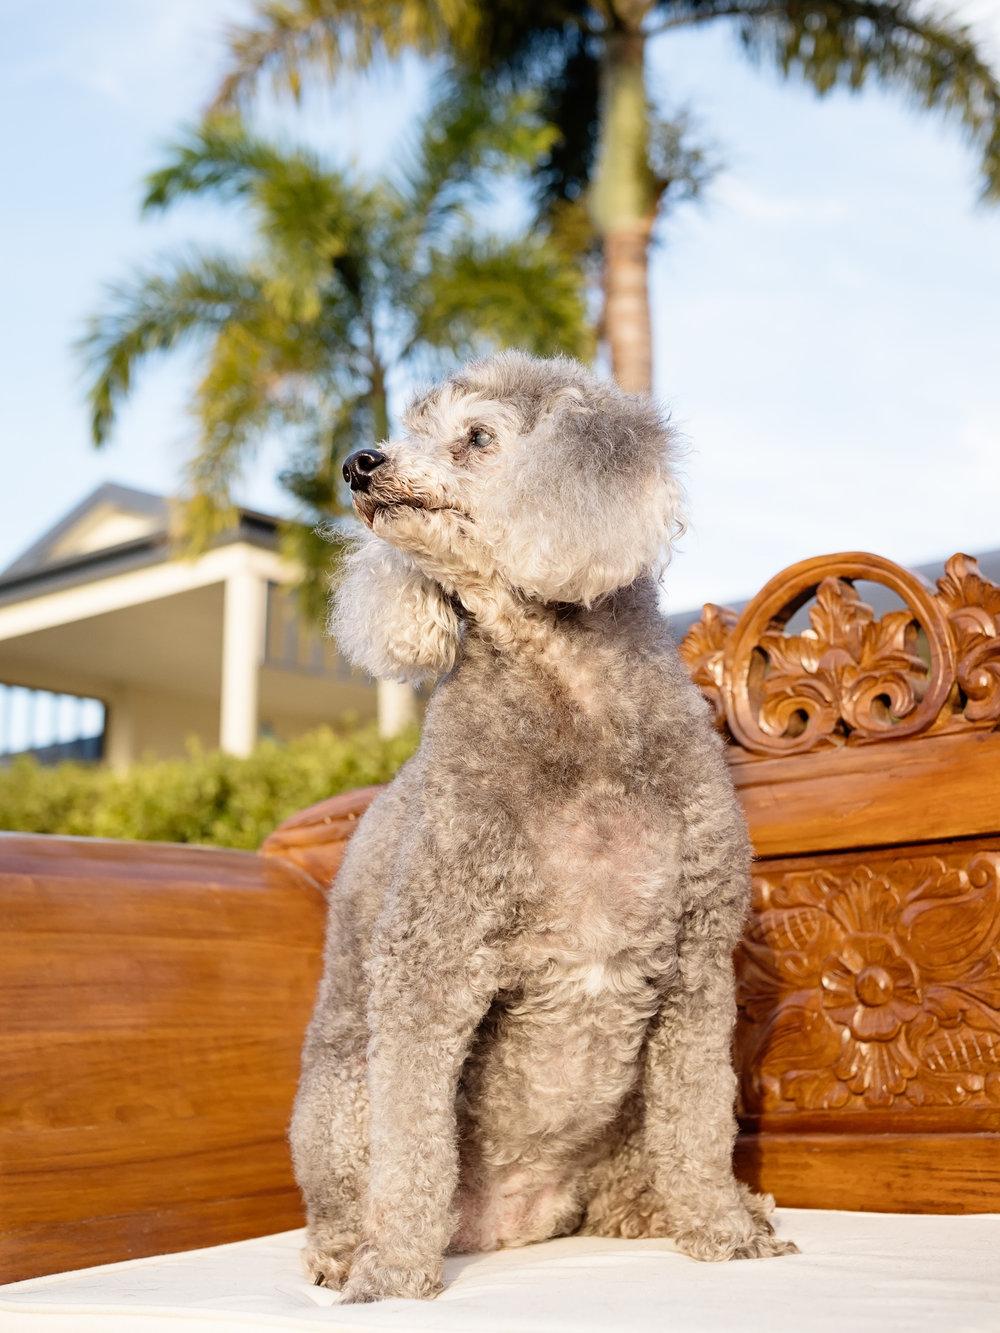 Bunny-Winston-Pet-Session-at-home-Farleigh-Mackay-2.jpg